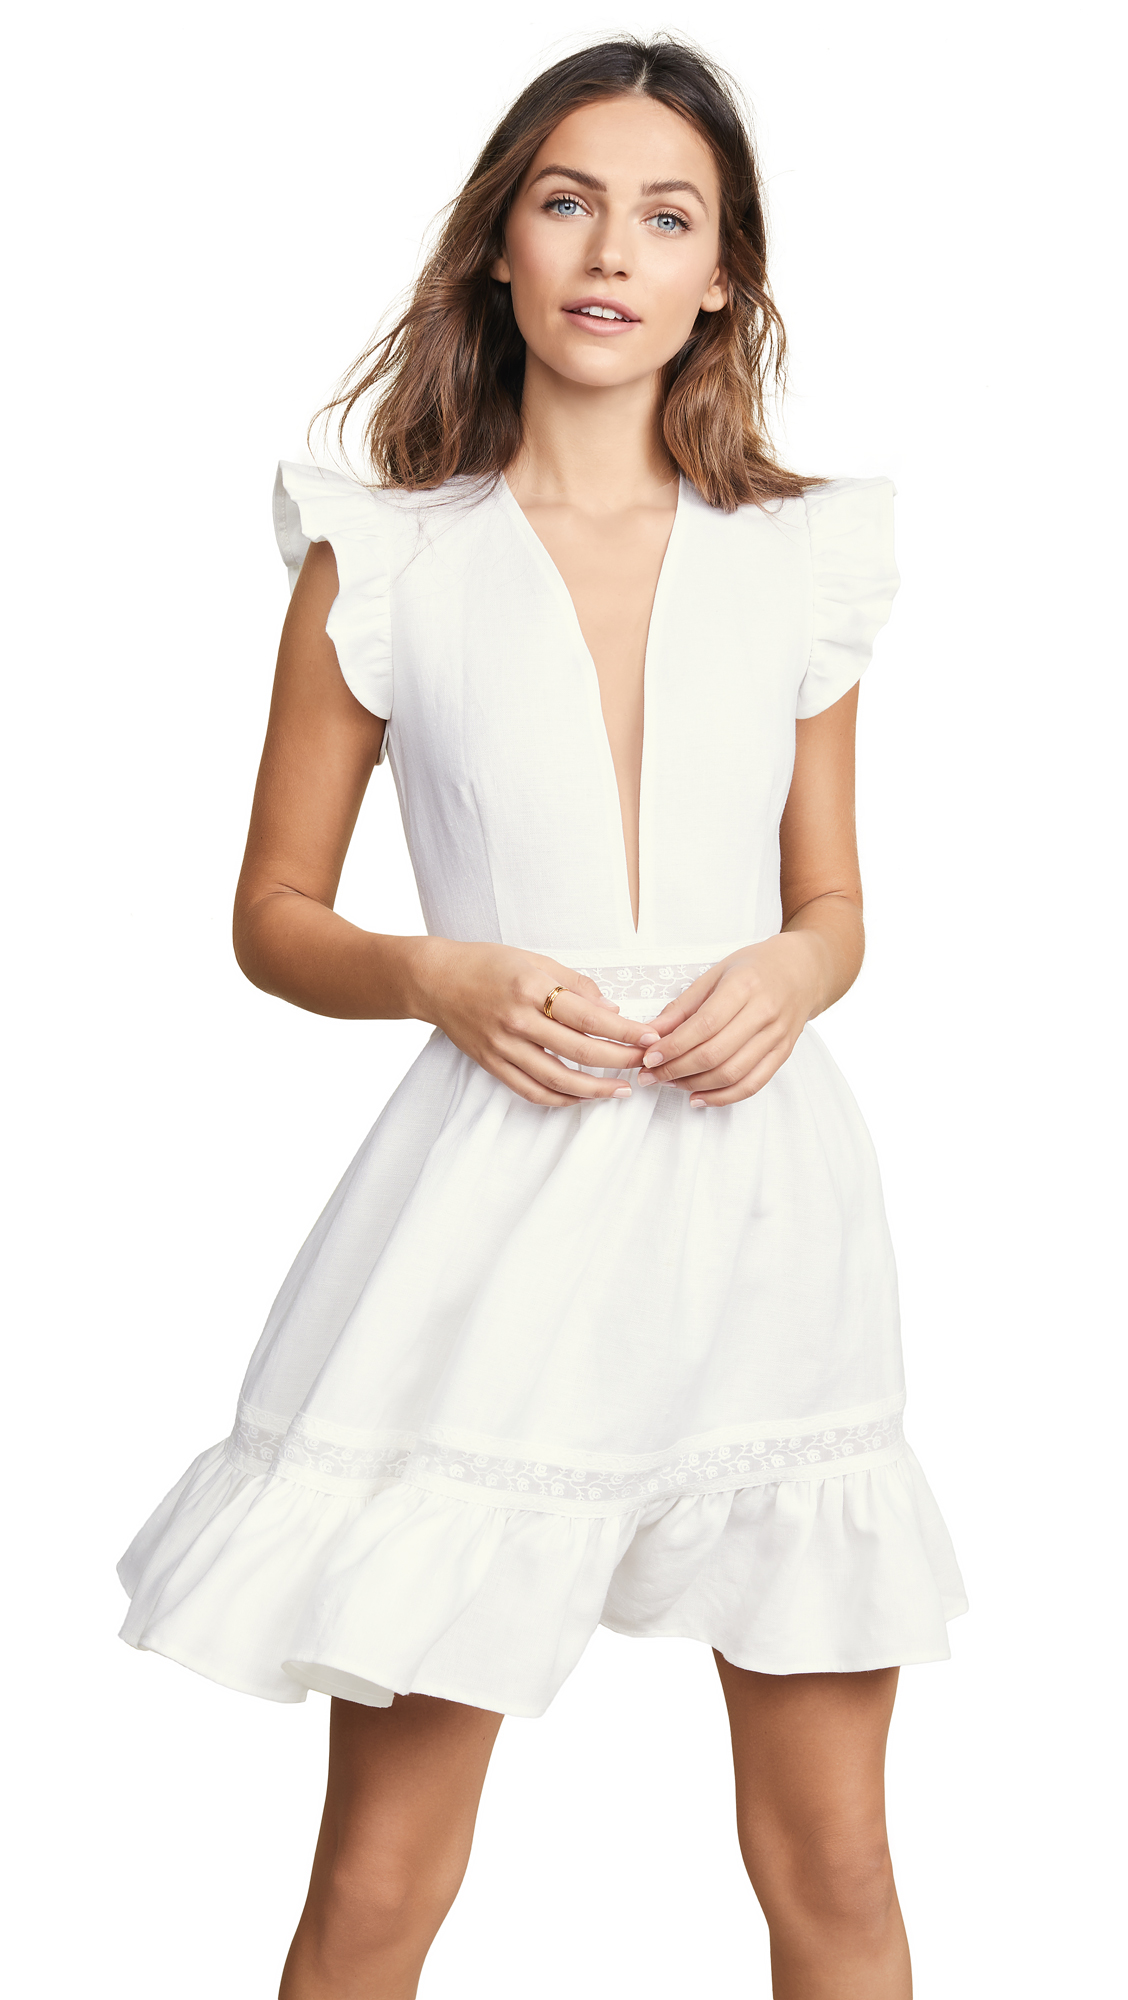 EWA HERZOG Deep V Linen Dress in White